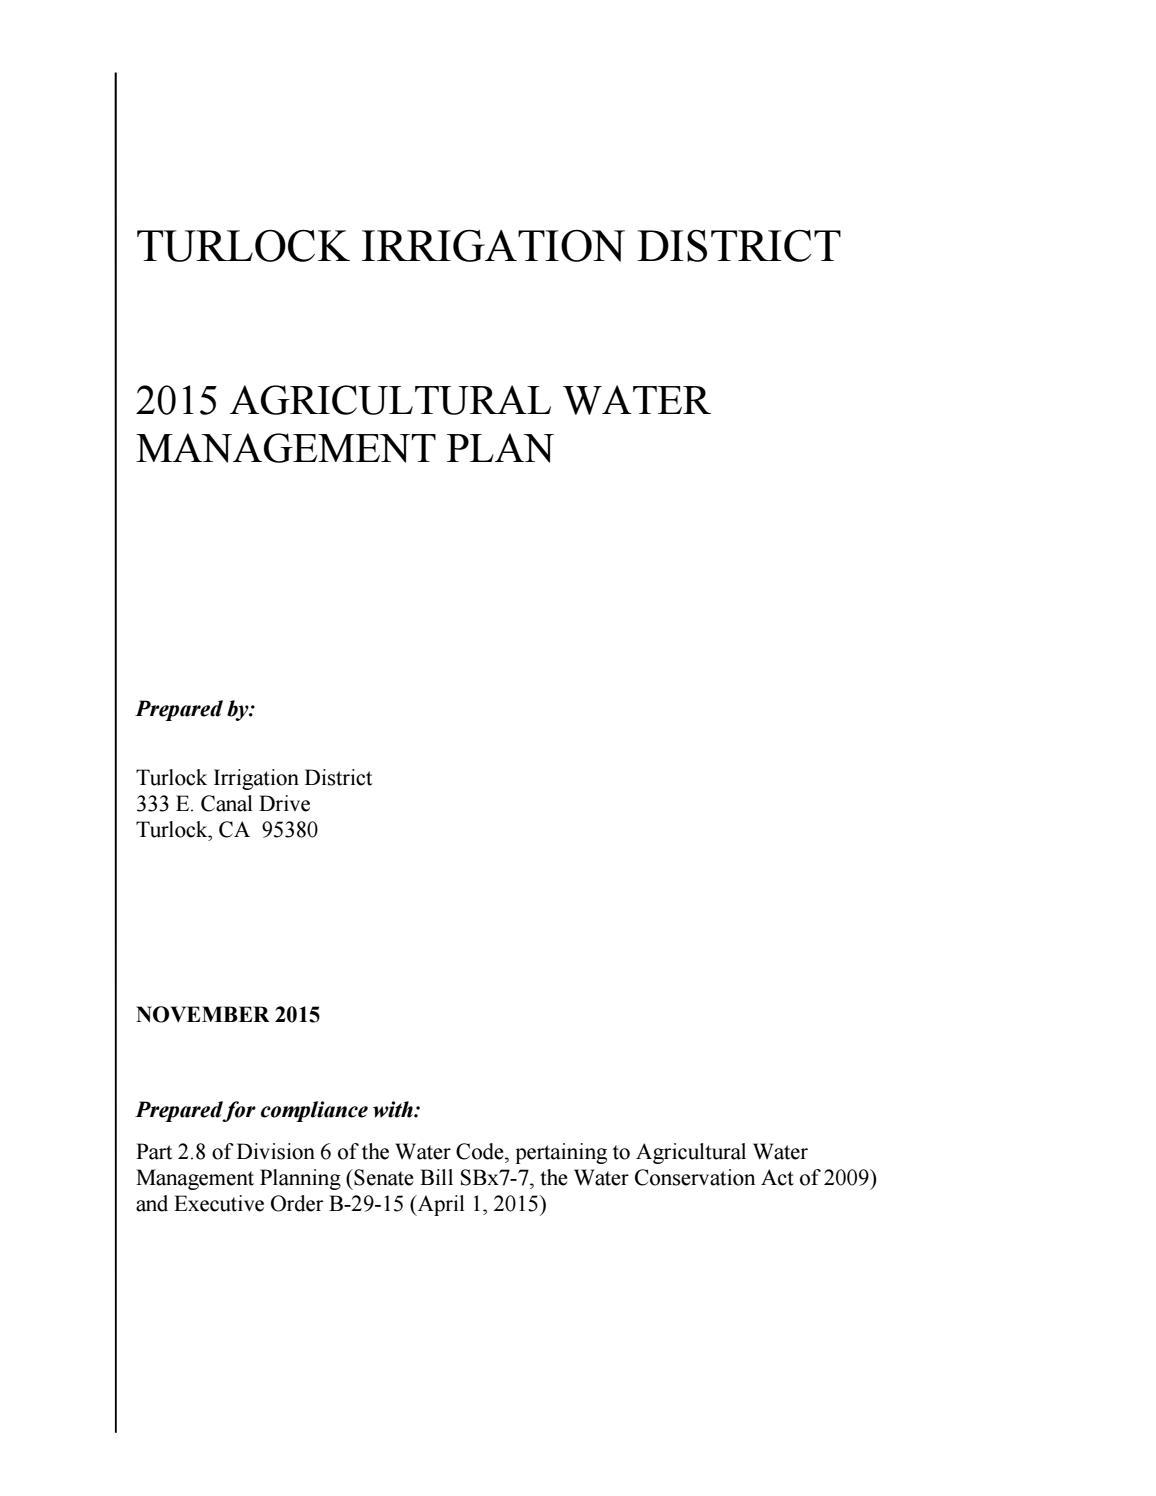 Tid Awmp 2015 Final 12 09 15 W Attachments (1) By Turlock Irrigation  District   Issuu